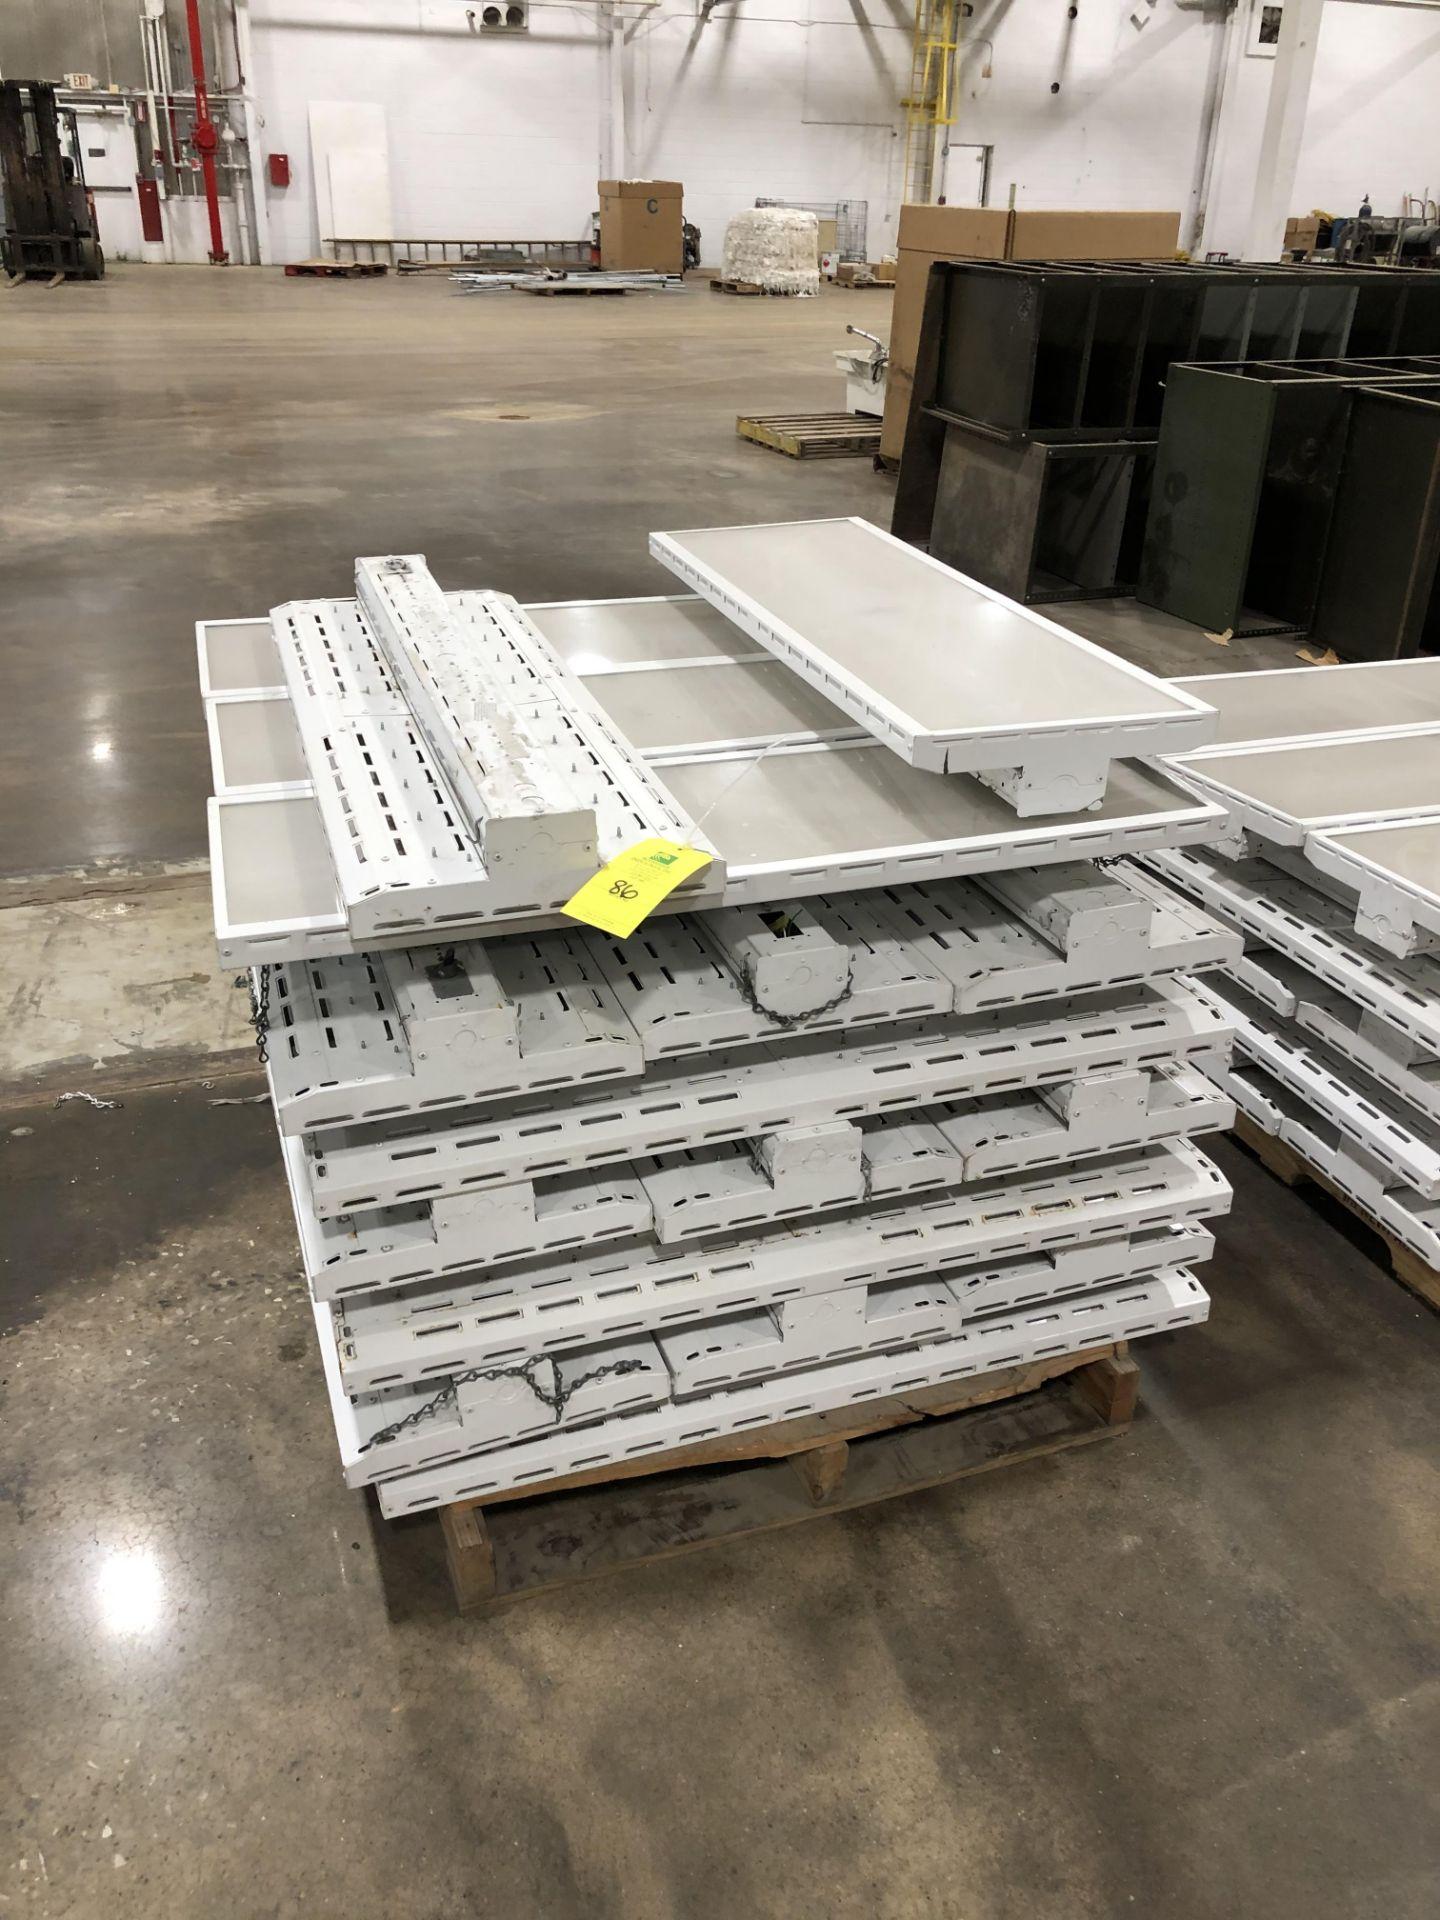 Lot 86 - Pallet of Commercial LED Warehouse lights, Rigging/ Loading Fee: $25